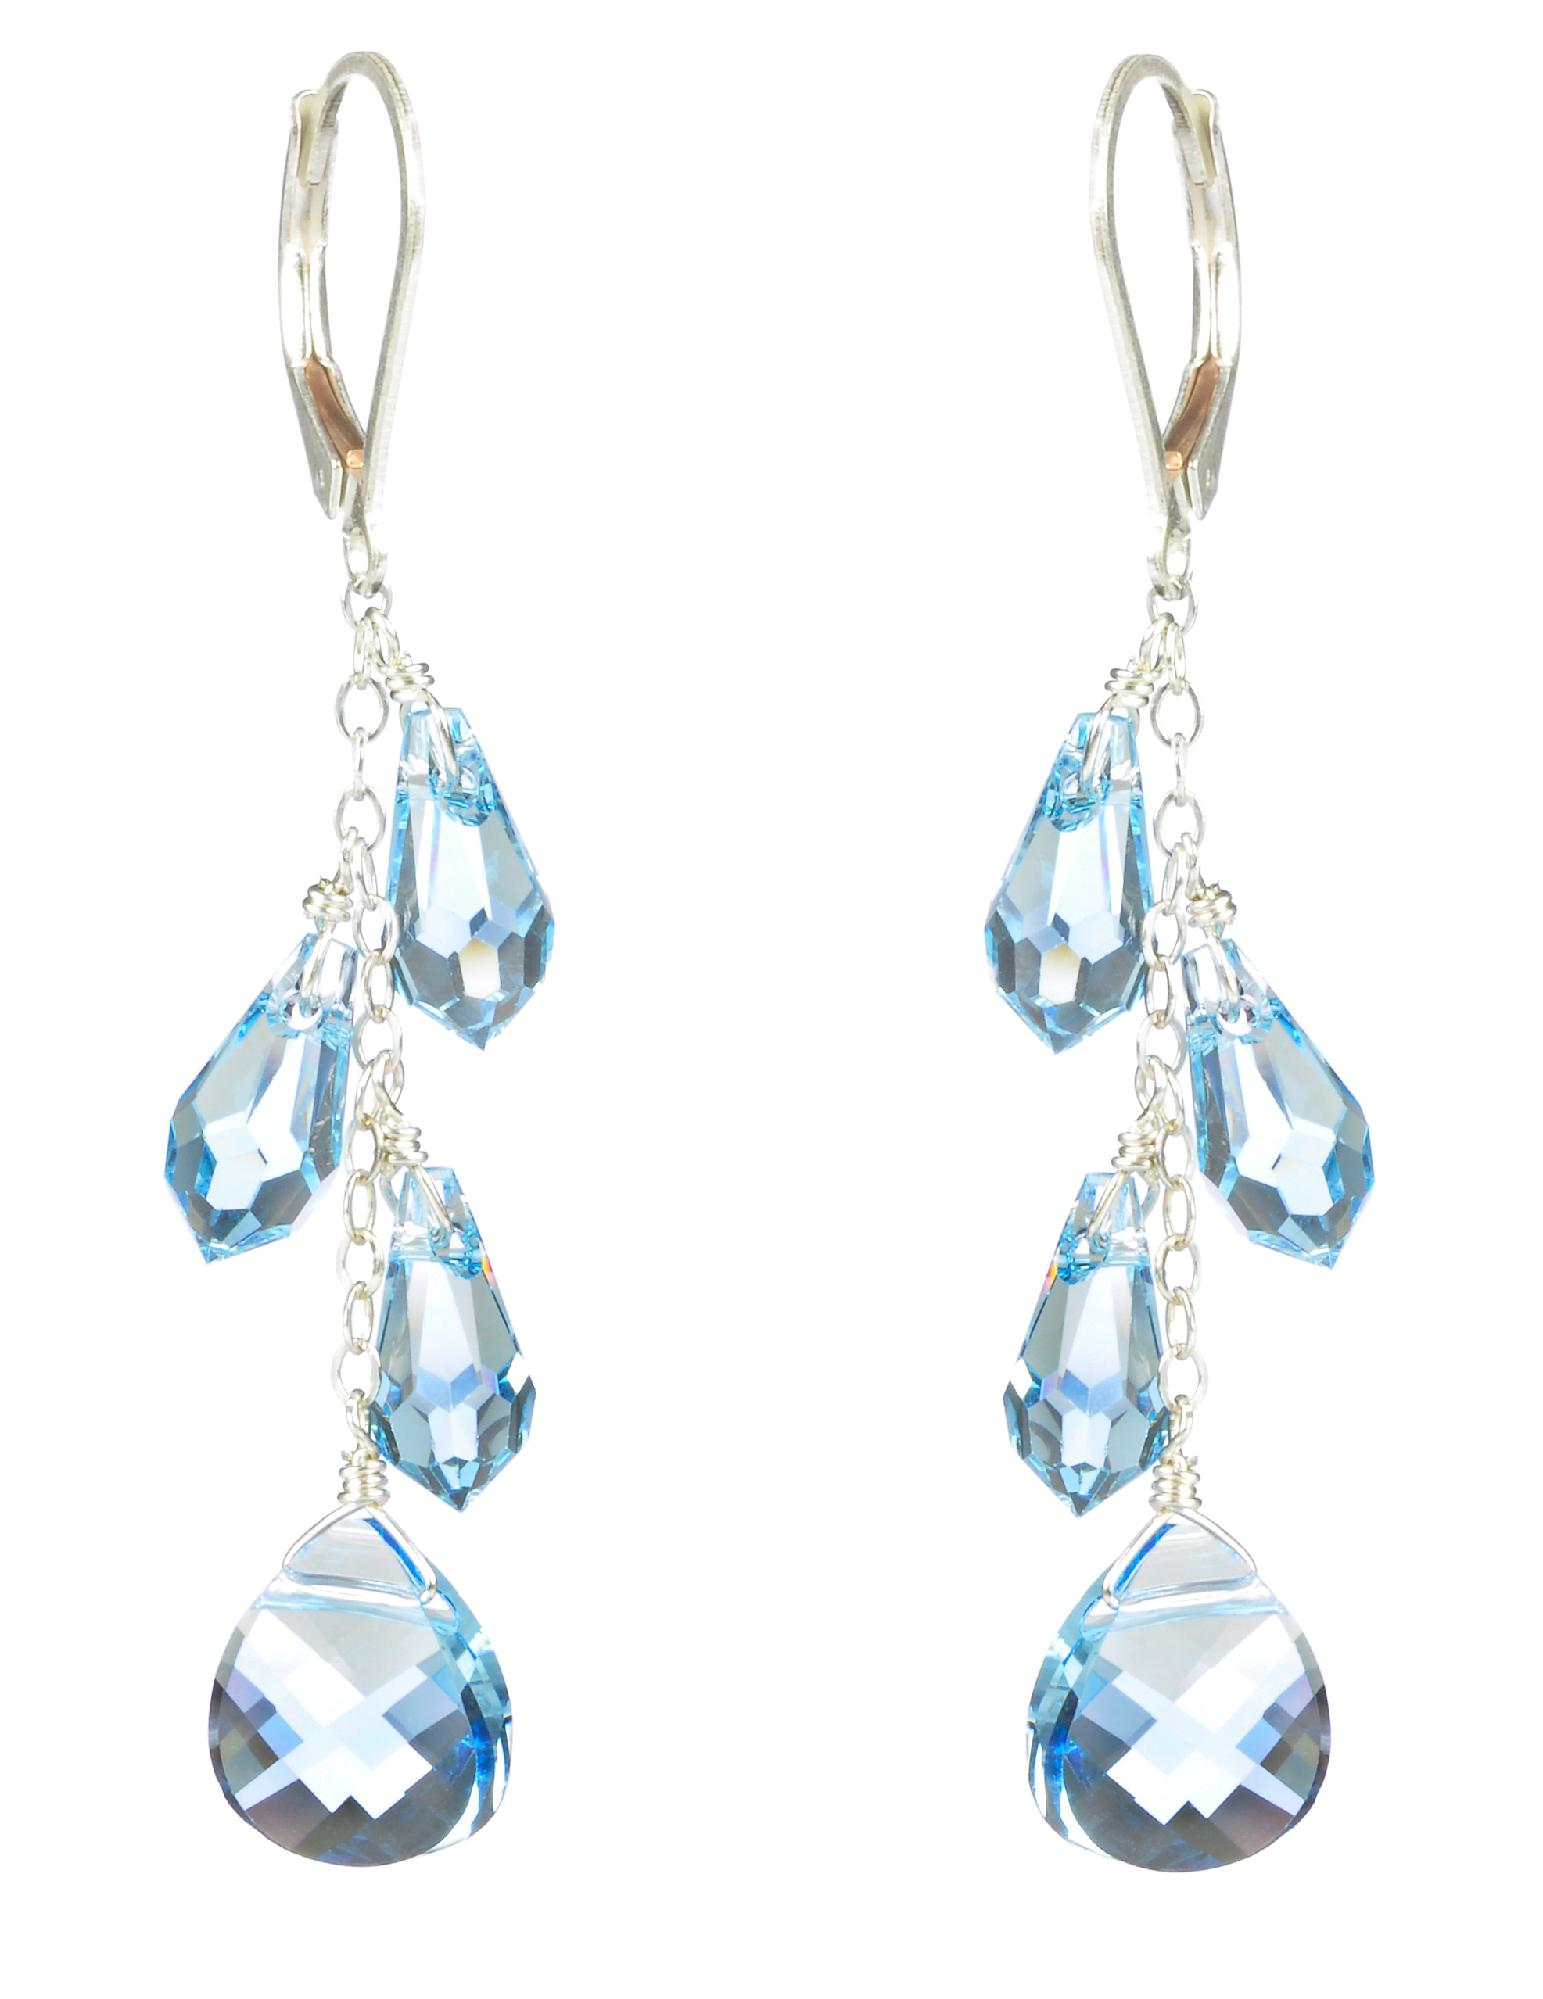 Lita Sterling Silver Swarovski Aquamarine Colored Teardrop Earrings